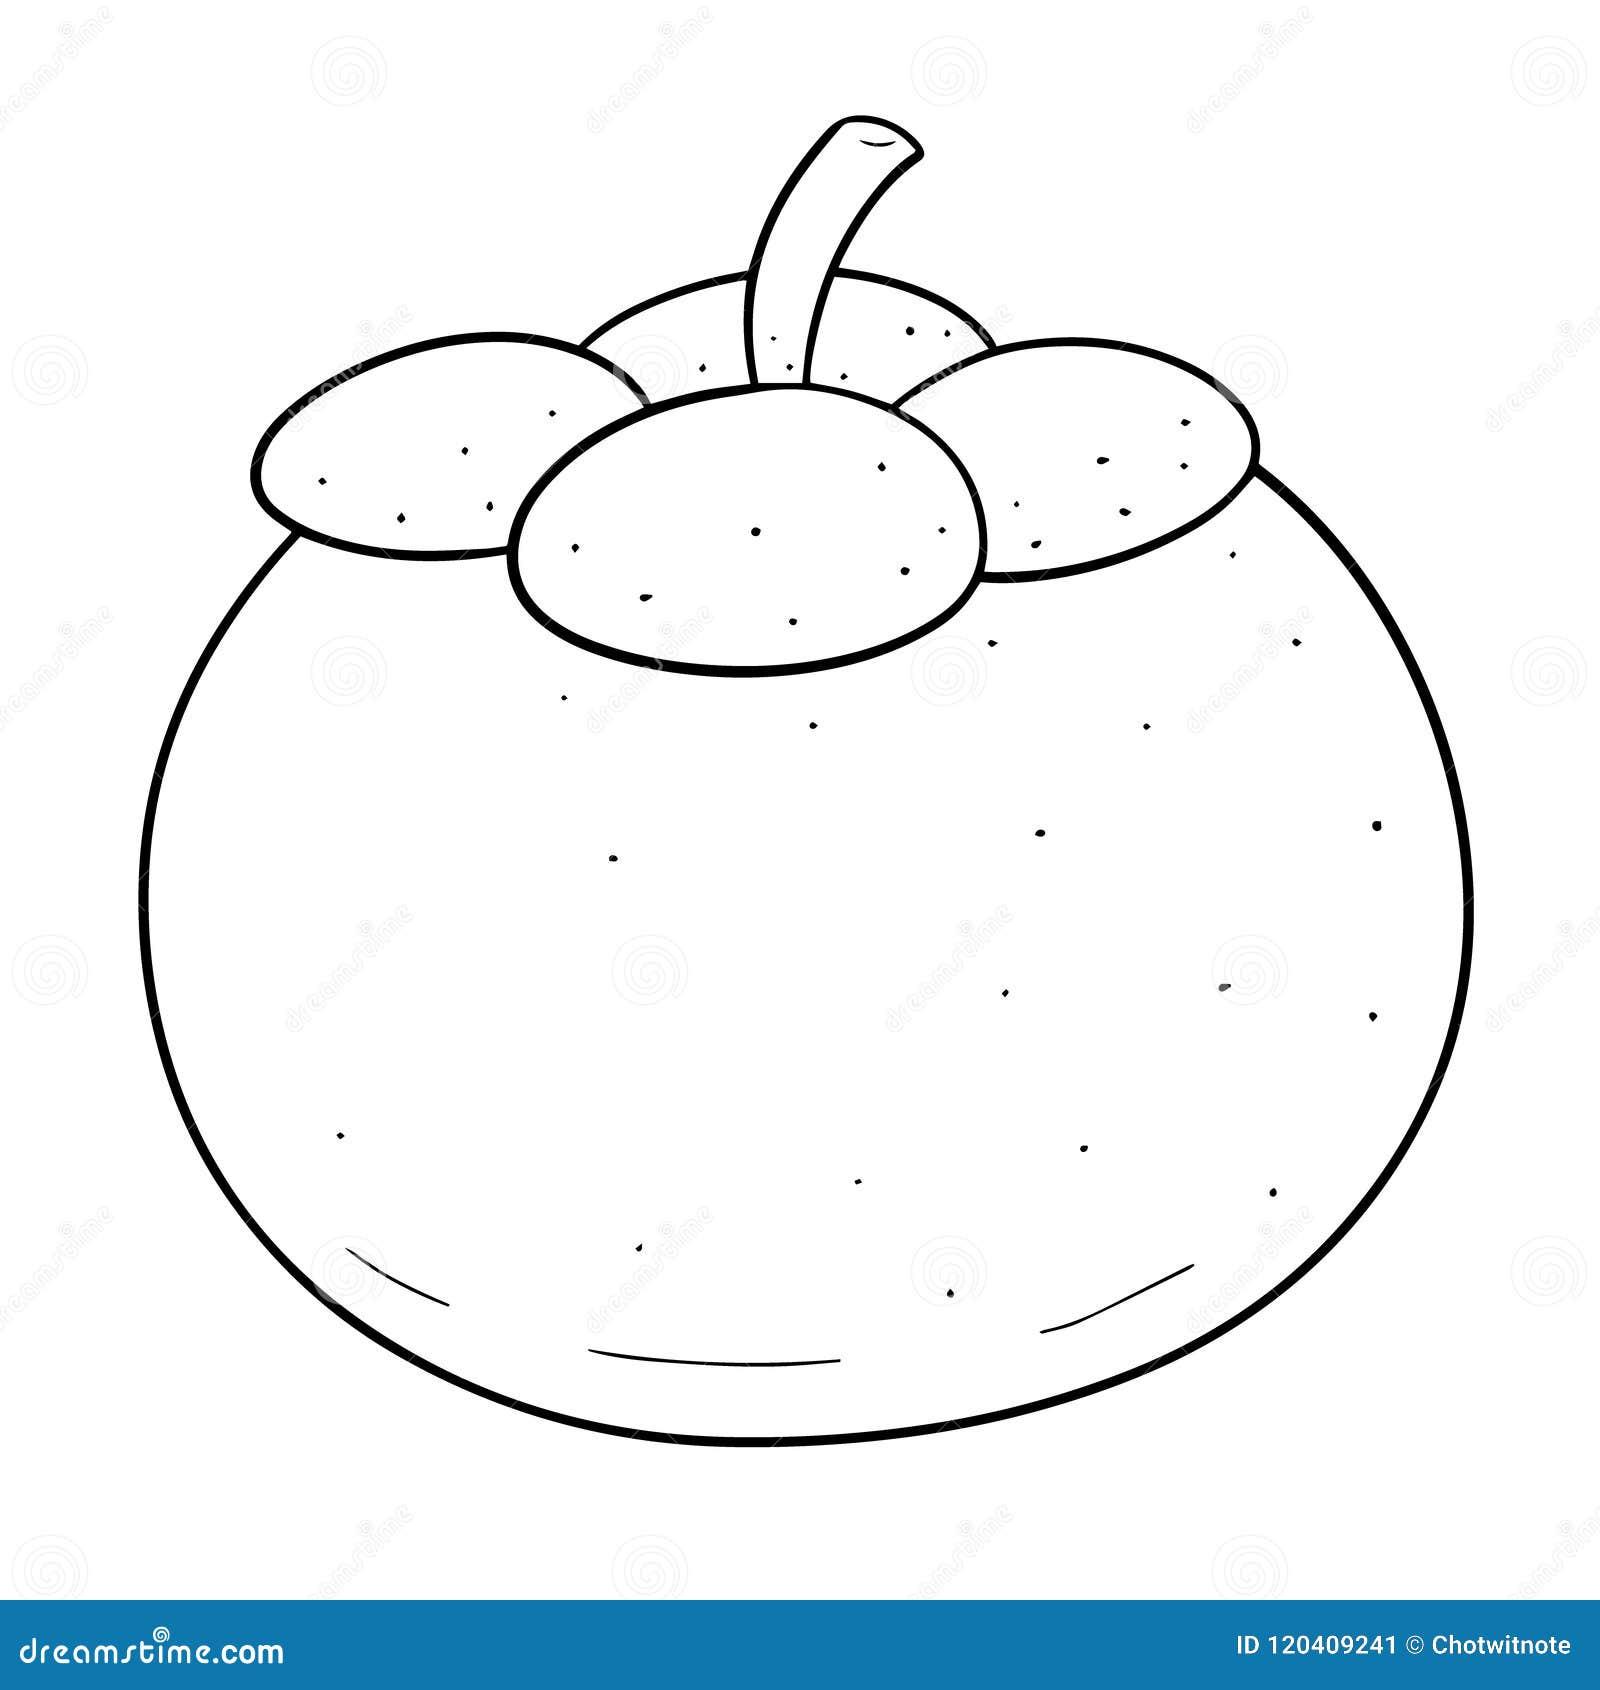 Vector Of Mangosteen Stock Vector Illustration Of Element 120409241